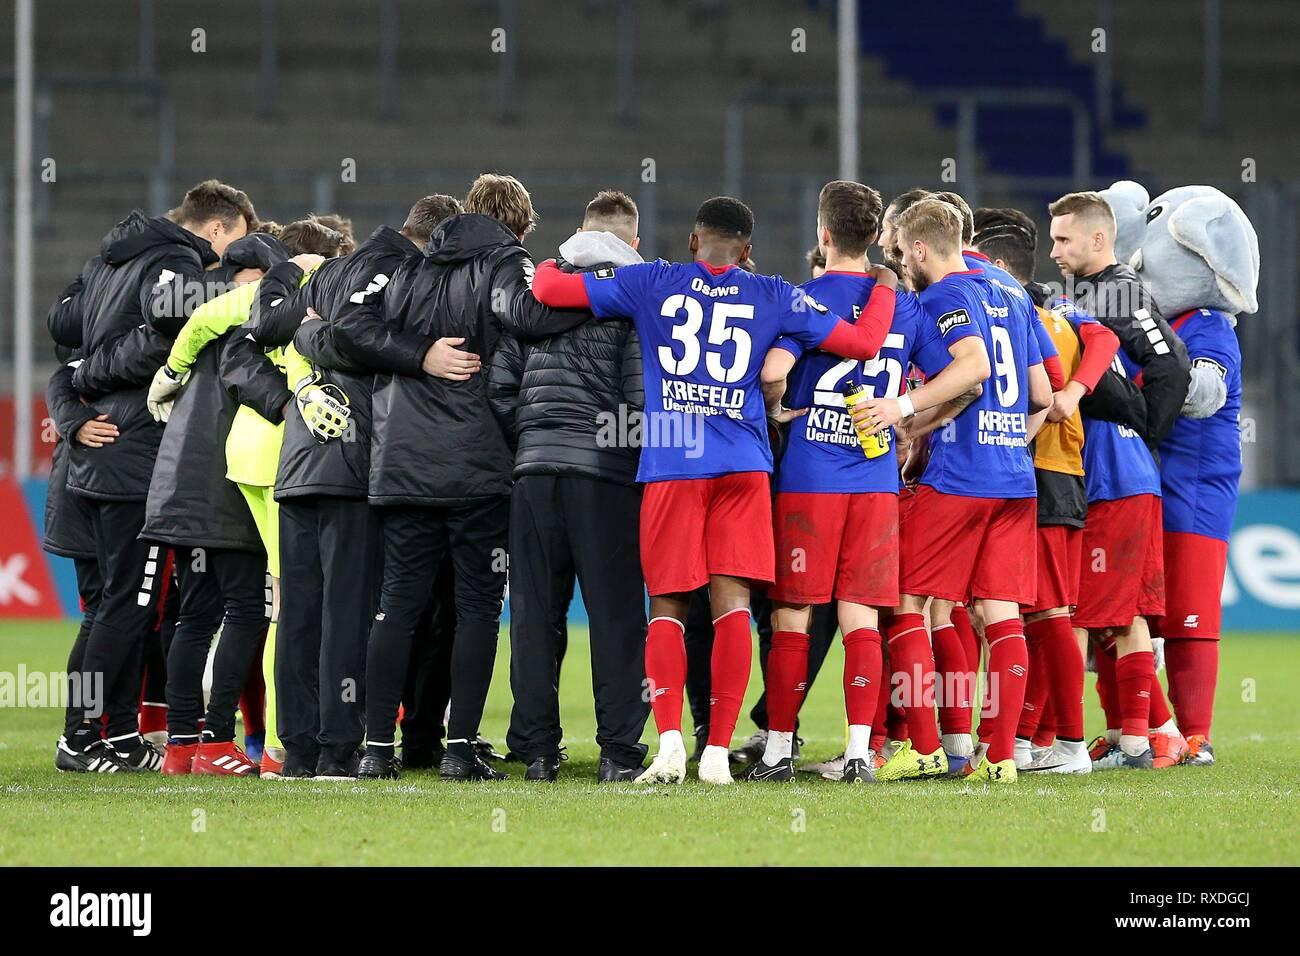 firo: 08.03.2019 Football, 3rd Bundesliga, season 2018/2019 KFC Uerdingen 05 - Karlsruher SC The Uerdinger make the final round. | usage worldwide - Stock Image